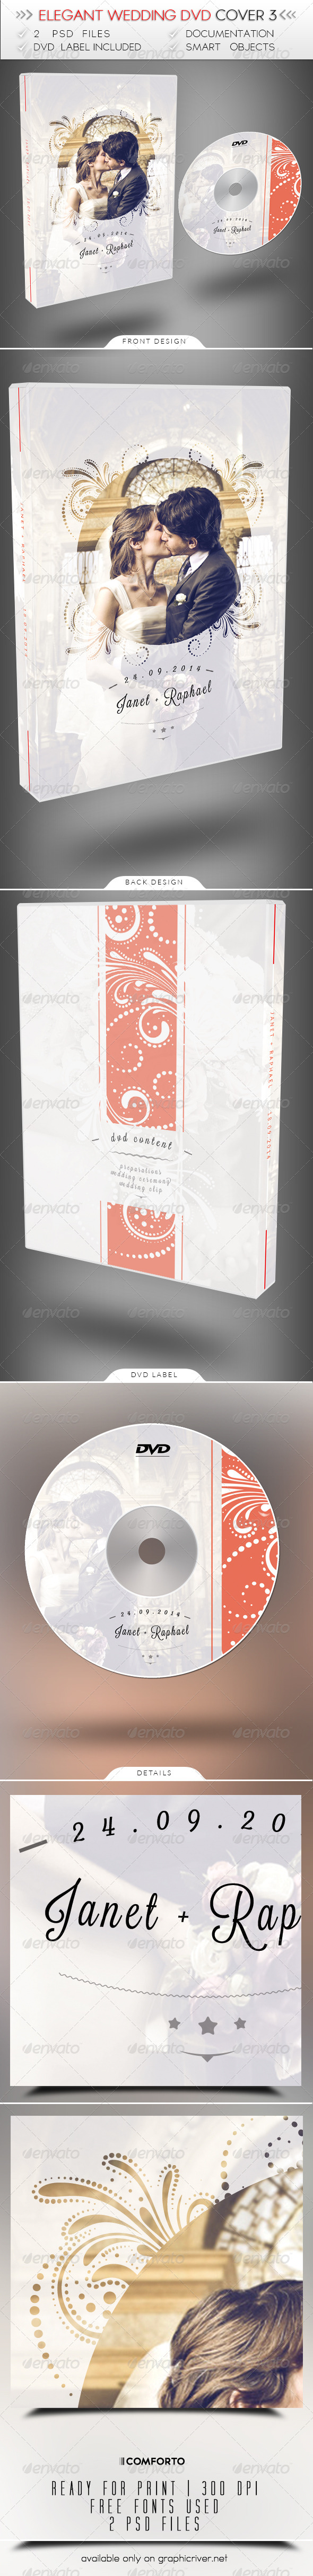 GraphicRiver Elegant Wedding DVD Cover 3 8156026